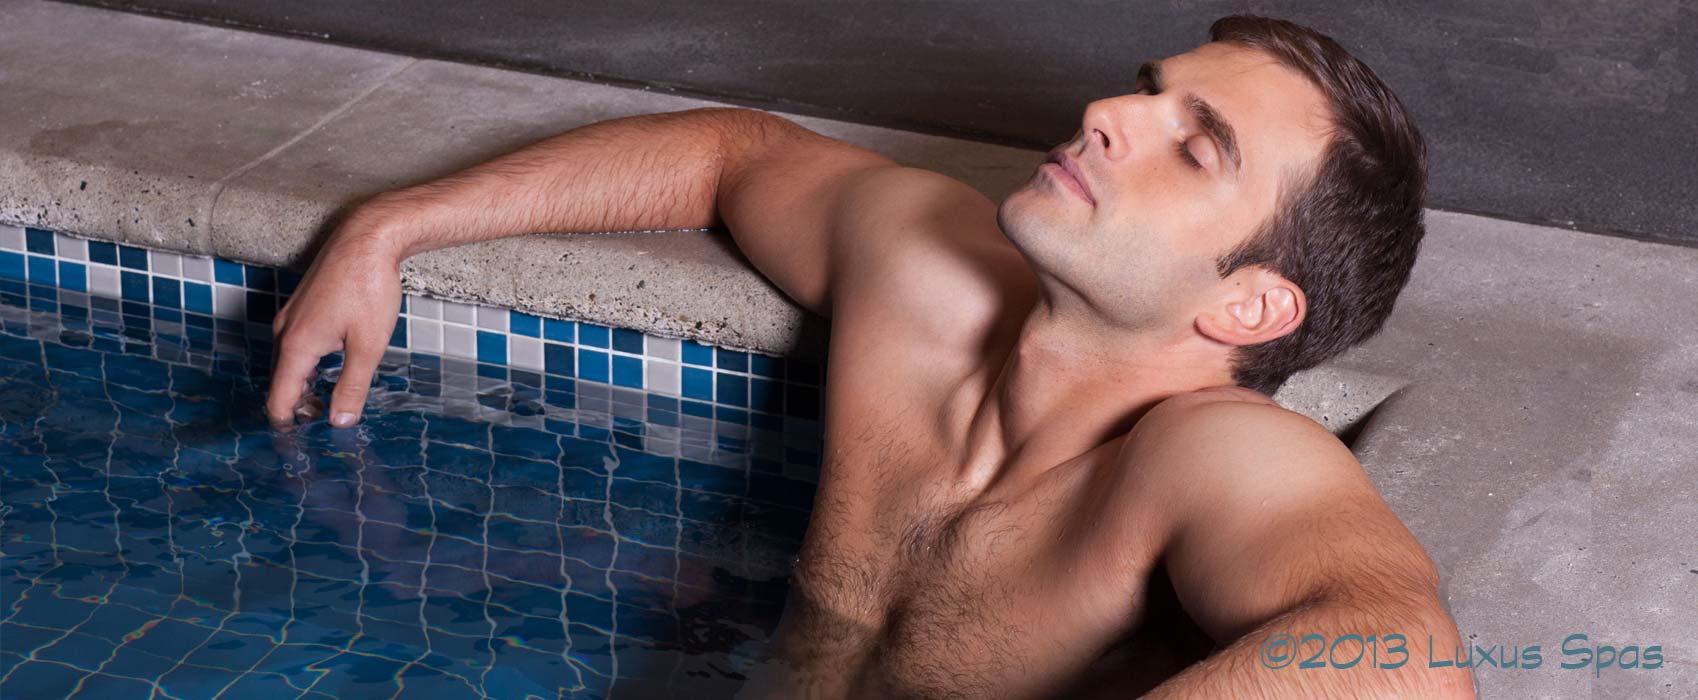 Enjoying a relaxing spa treatment.